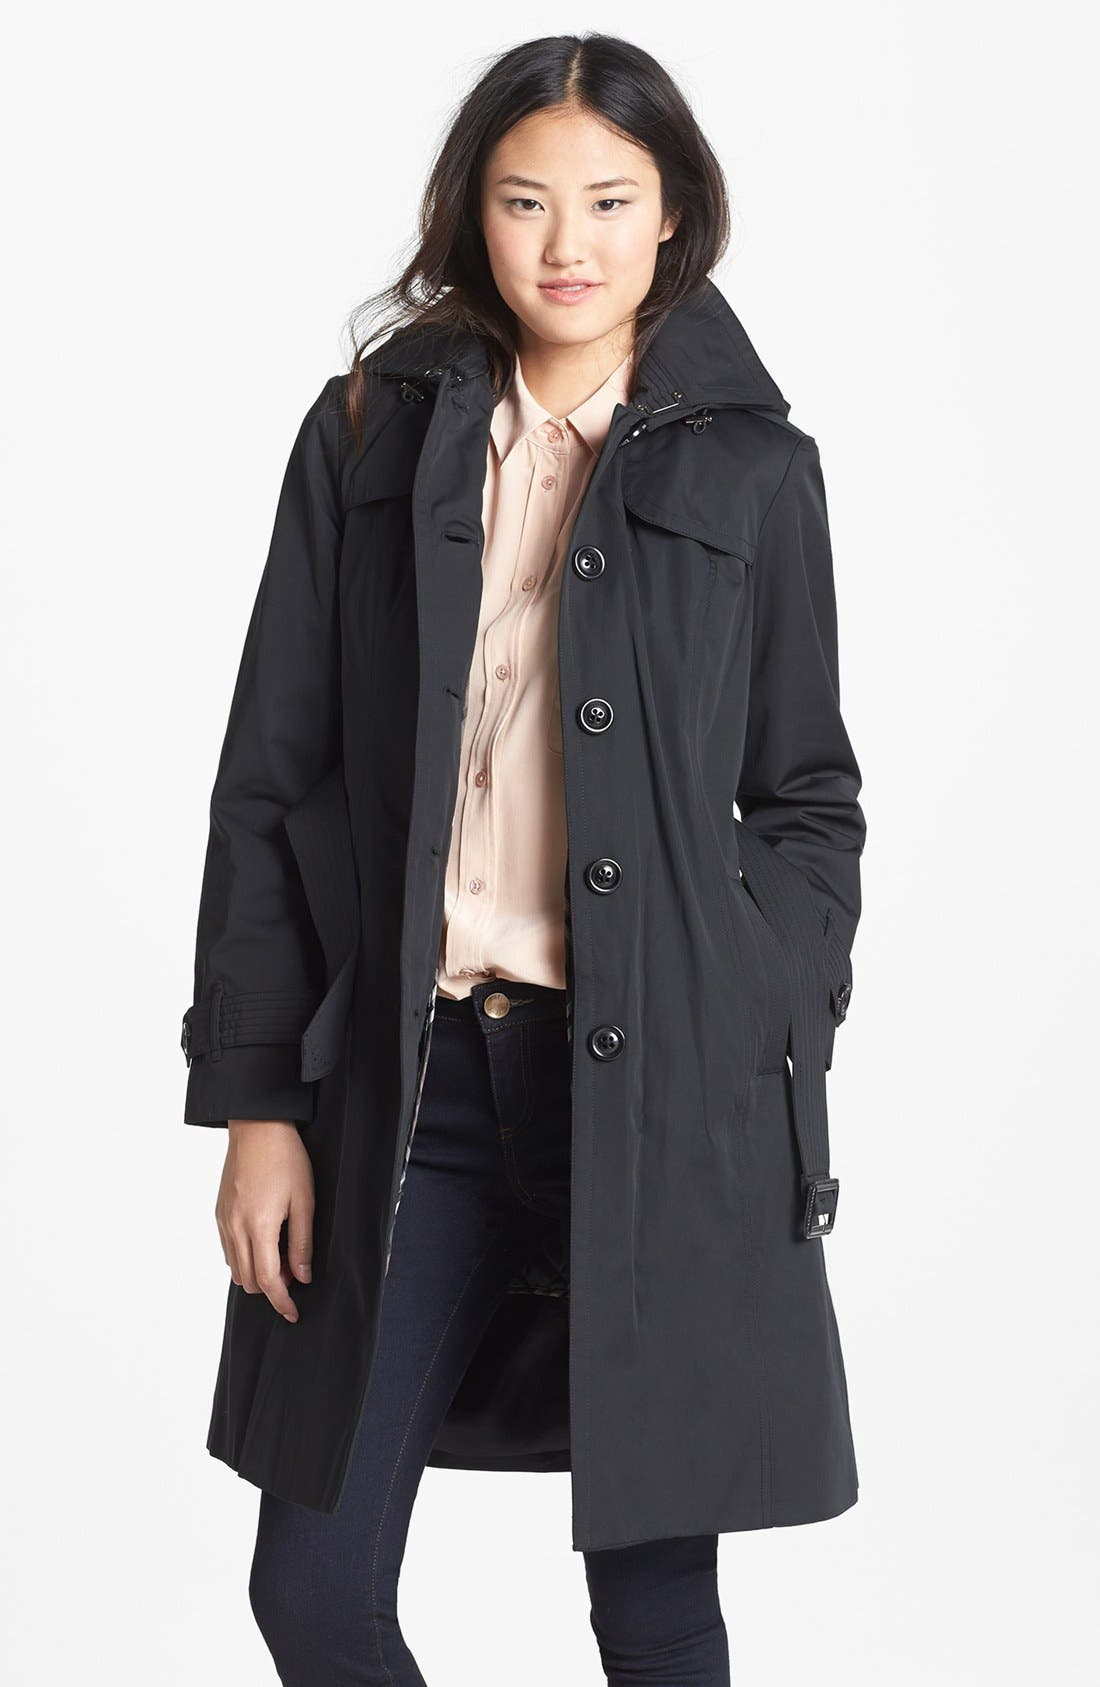 Alternate Image 1 Selected - London Fog Trench Coat with Detachable Hood & Liner (Regular) (Online Only)